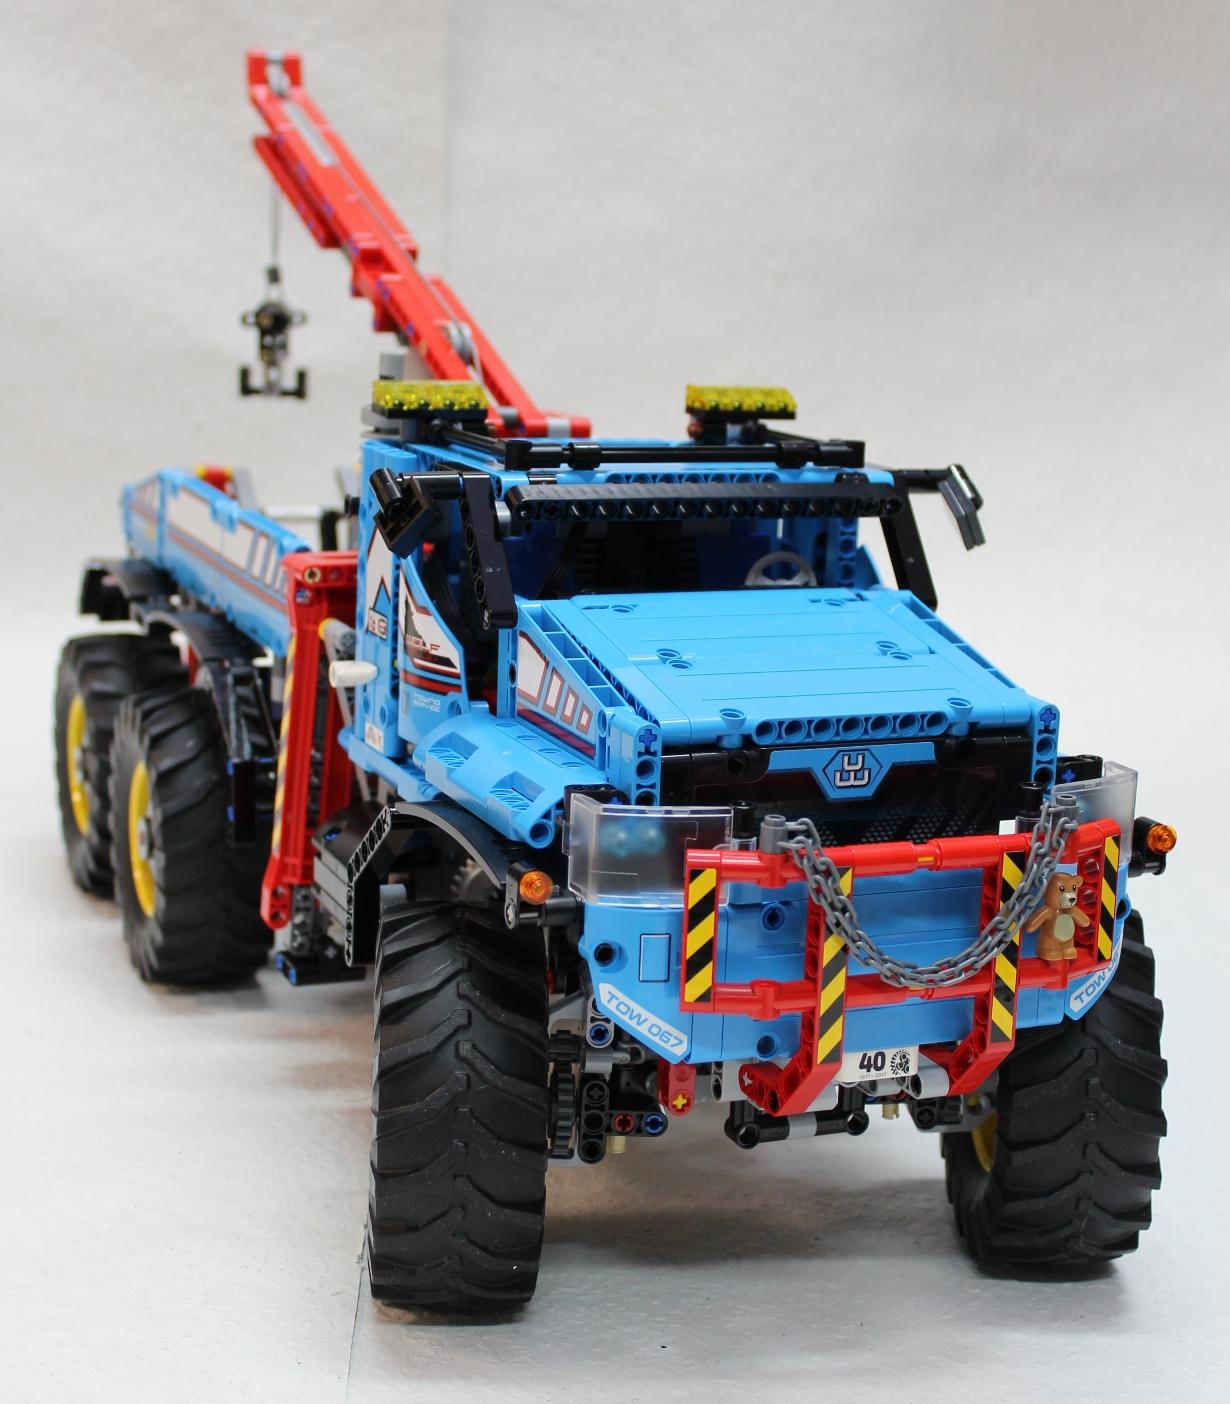 lego-technic-allrad-abschleppwagen-42070-andre-micko zusammengebaut.com